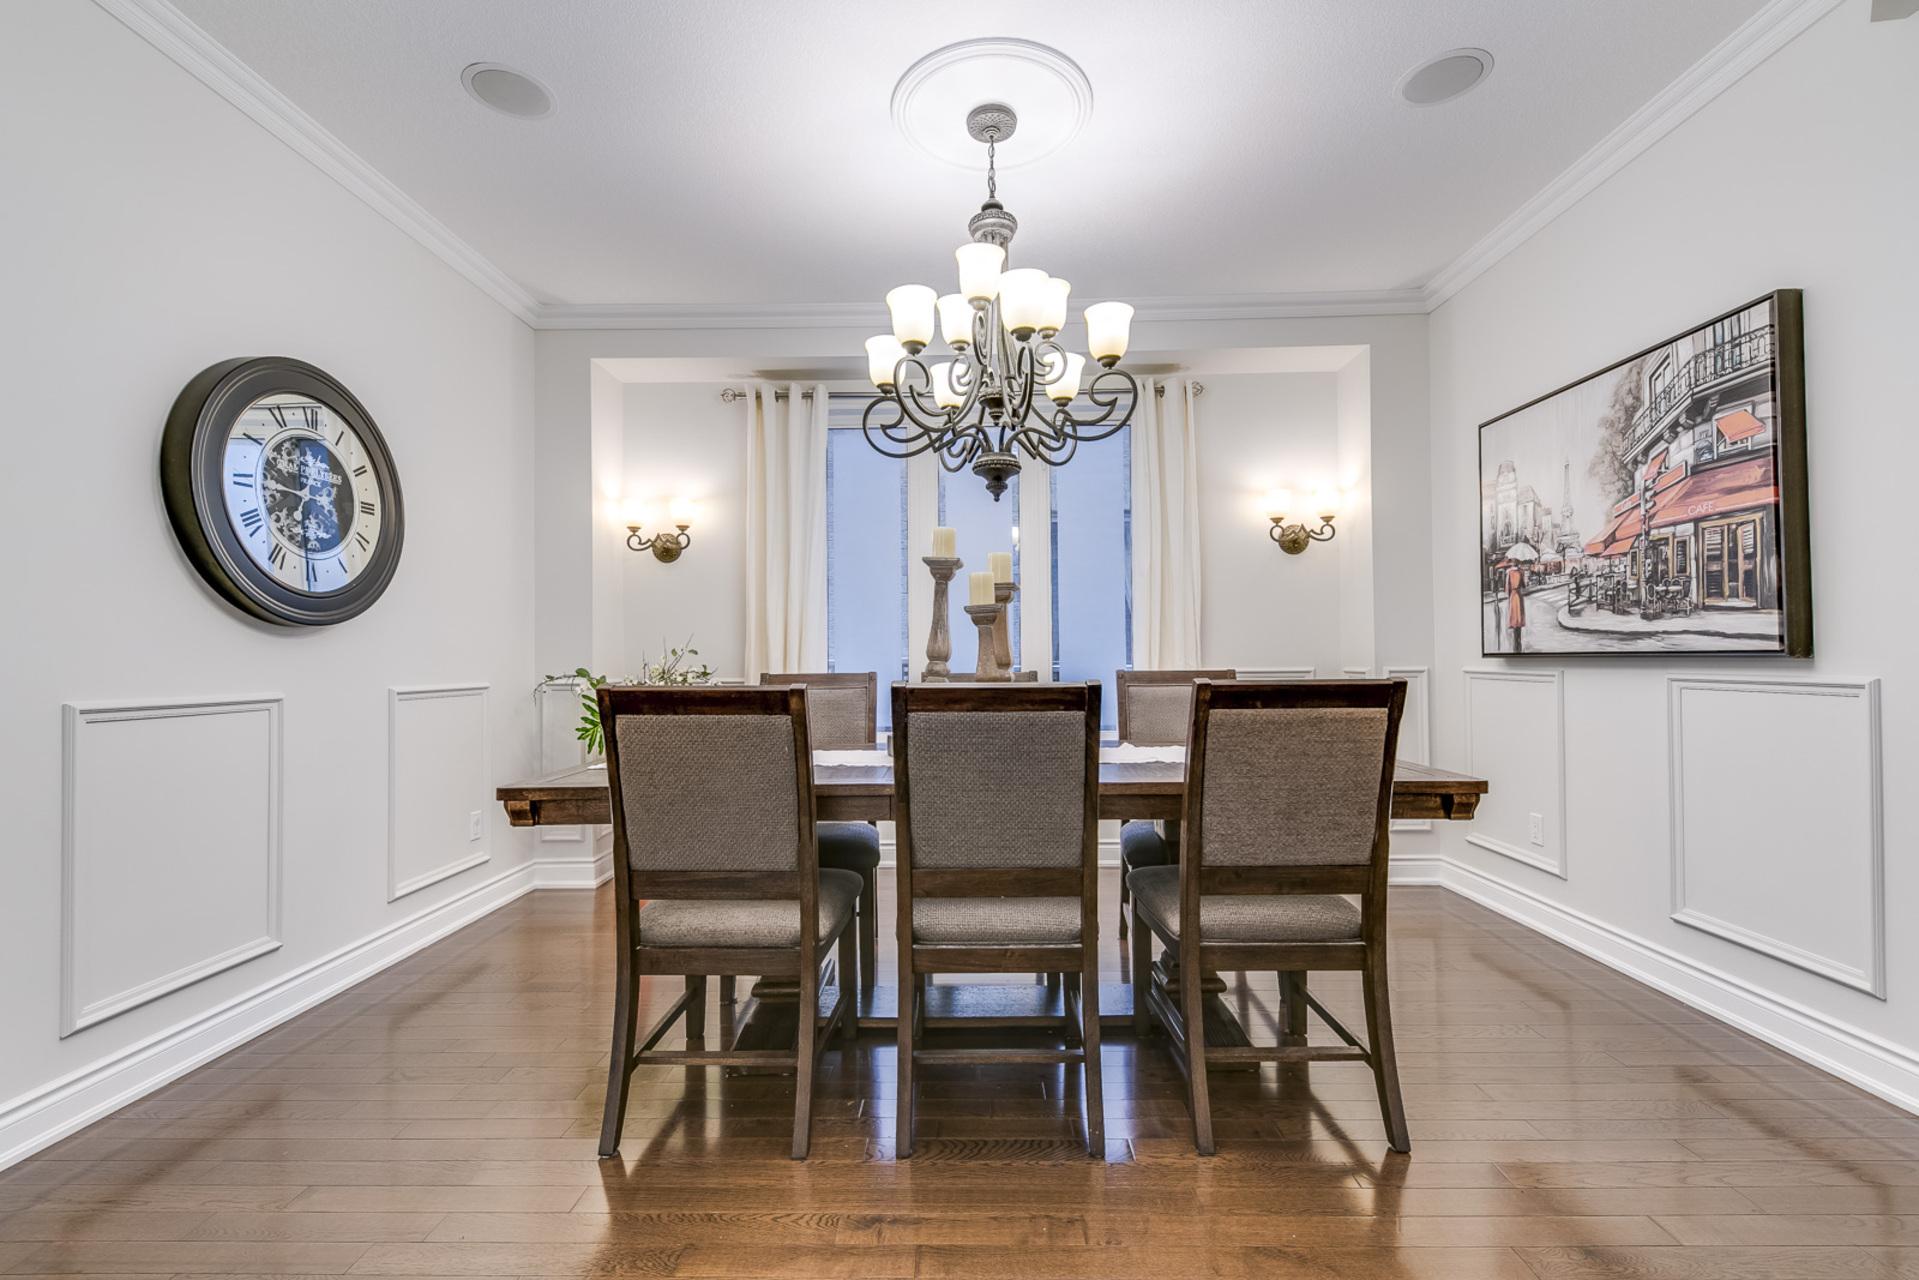 Dining Room - 2473 Tesla Cres, Oakville - Elite3 & Team at 2473 Tesla Crescent, Iroquois Ridge North, Oakville